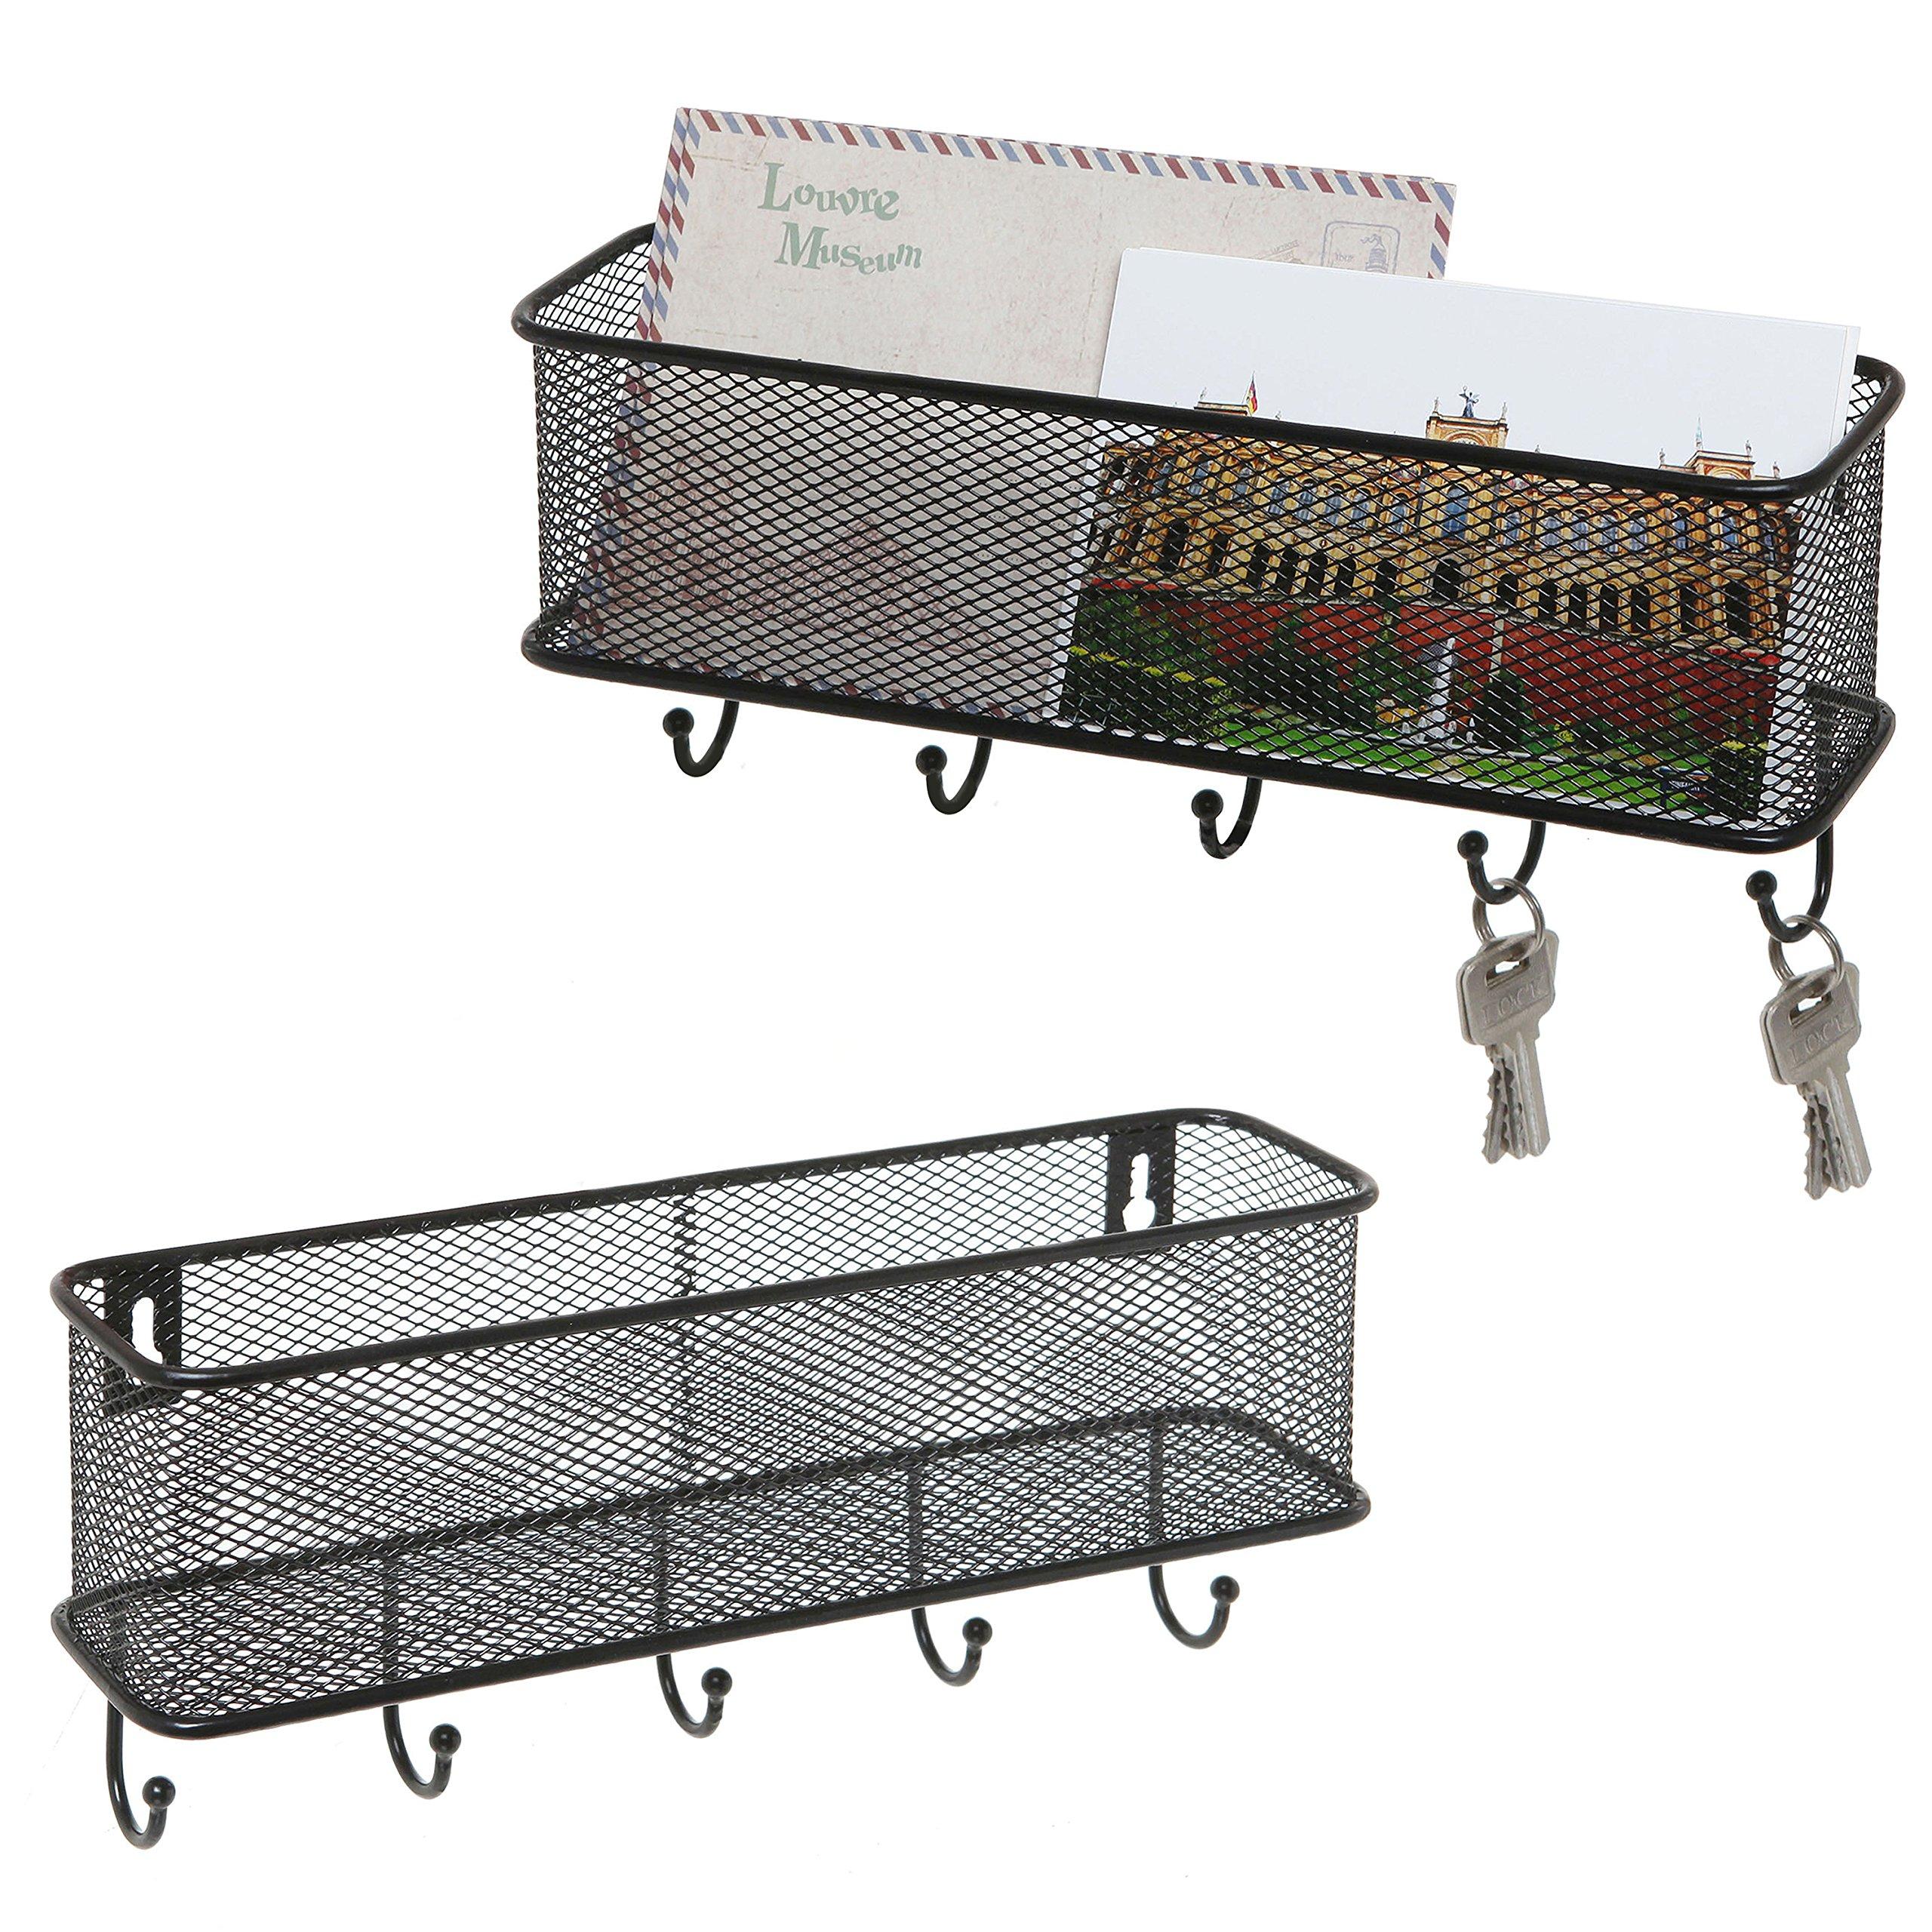 Modern Black Wall Mounted 5 Key Hook Rack with Metal Wire Mesh Mail Basket, Set of 2